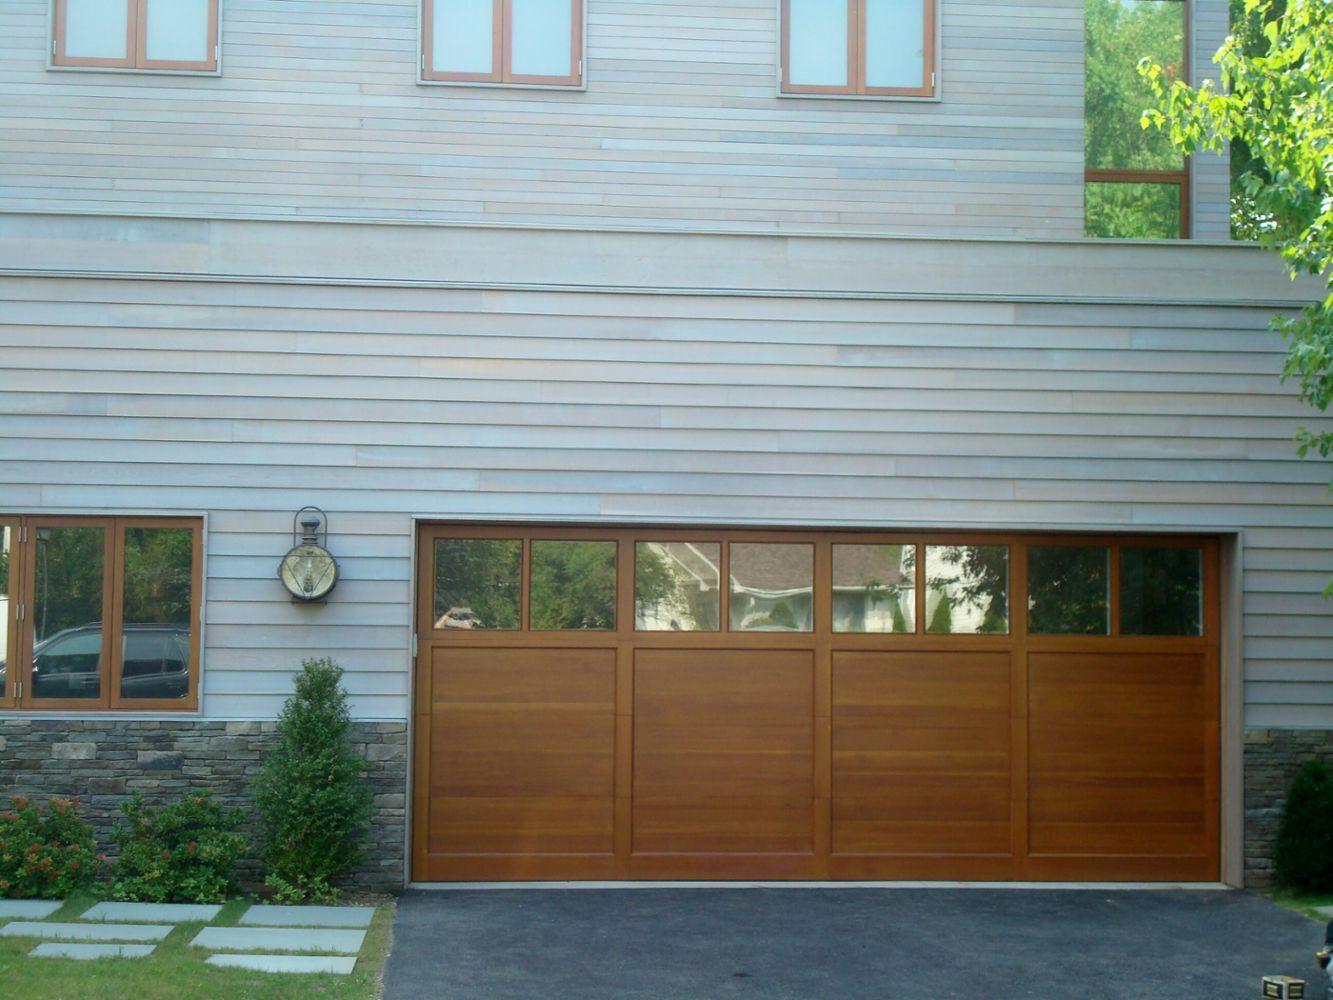 Garage Door Repair Amp Installation In Ballwin Mo Garage